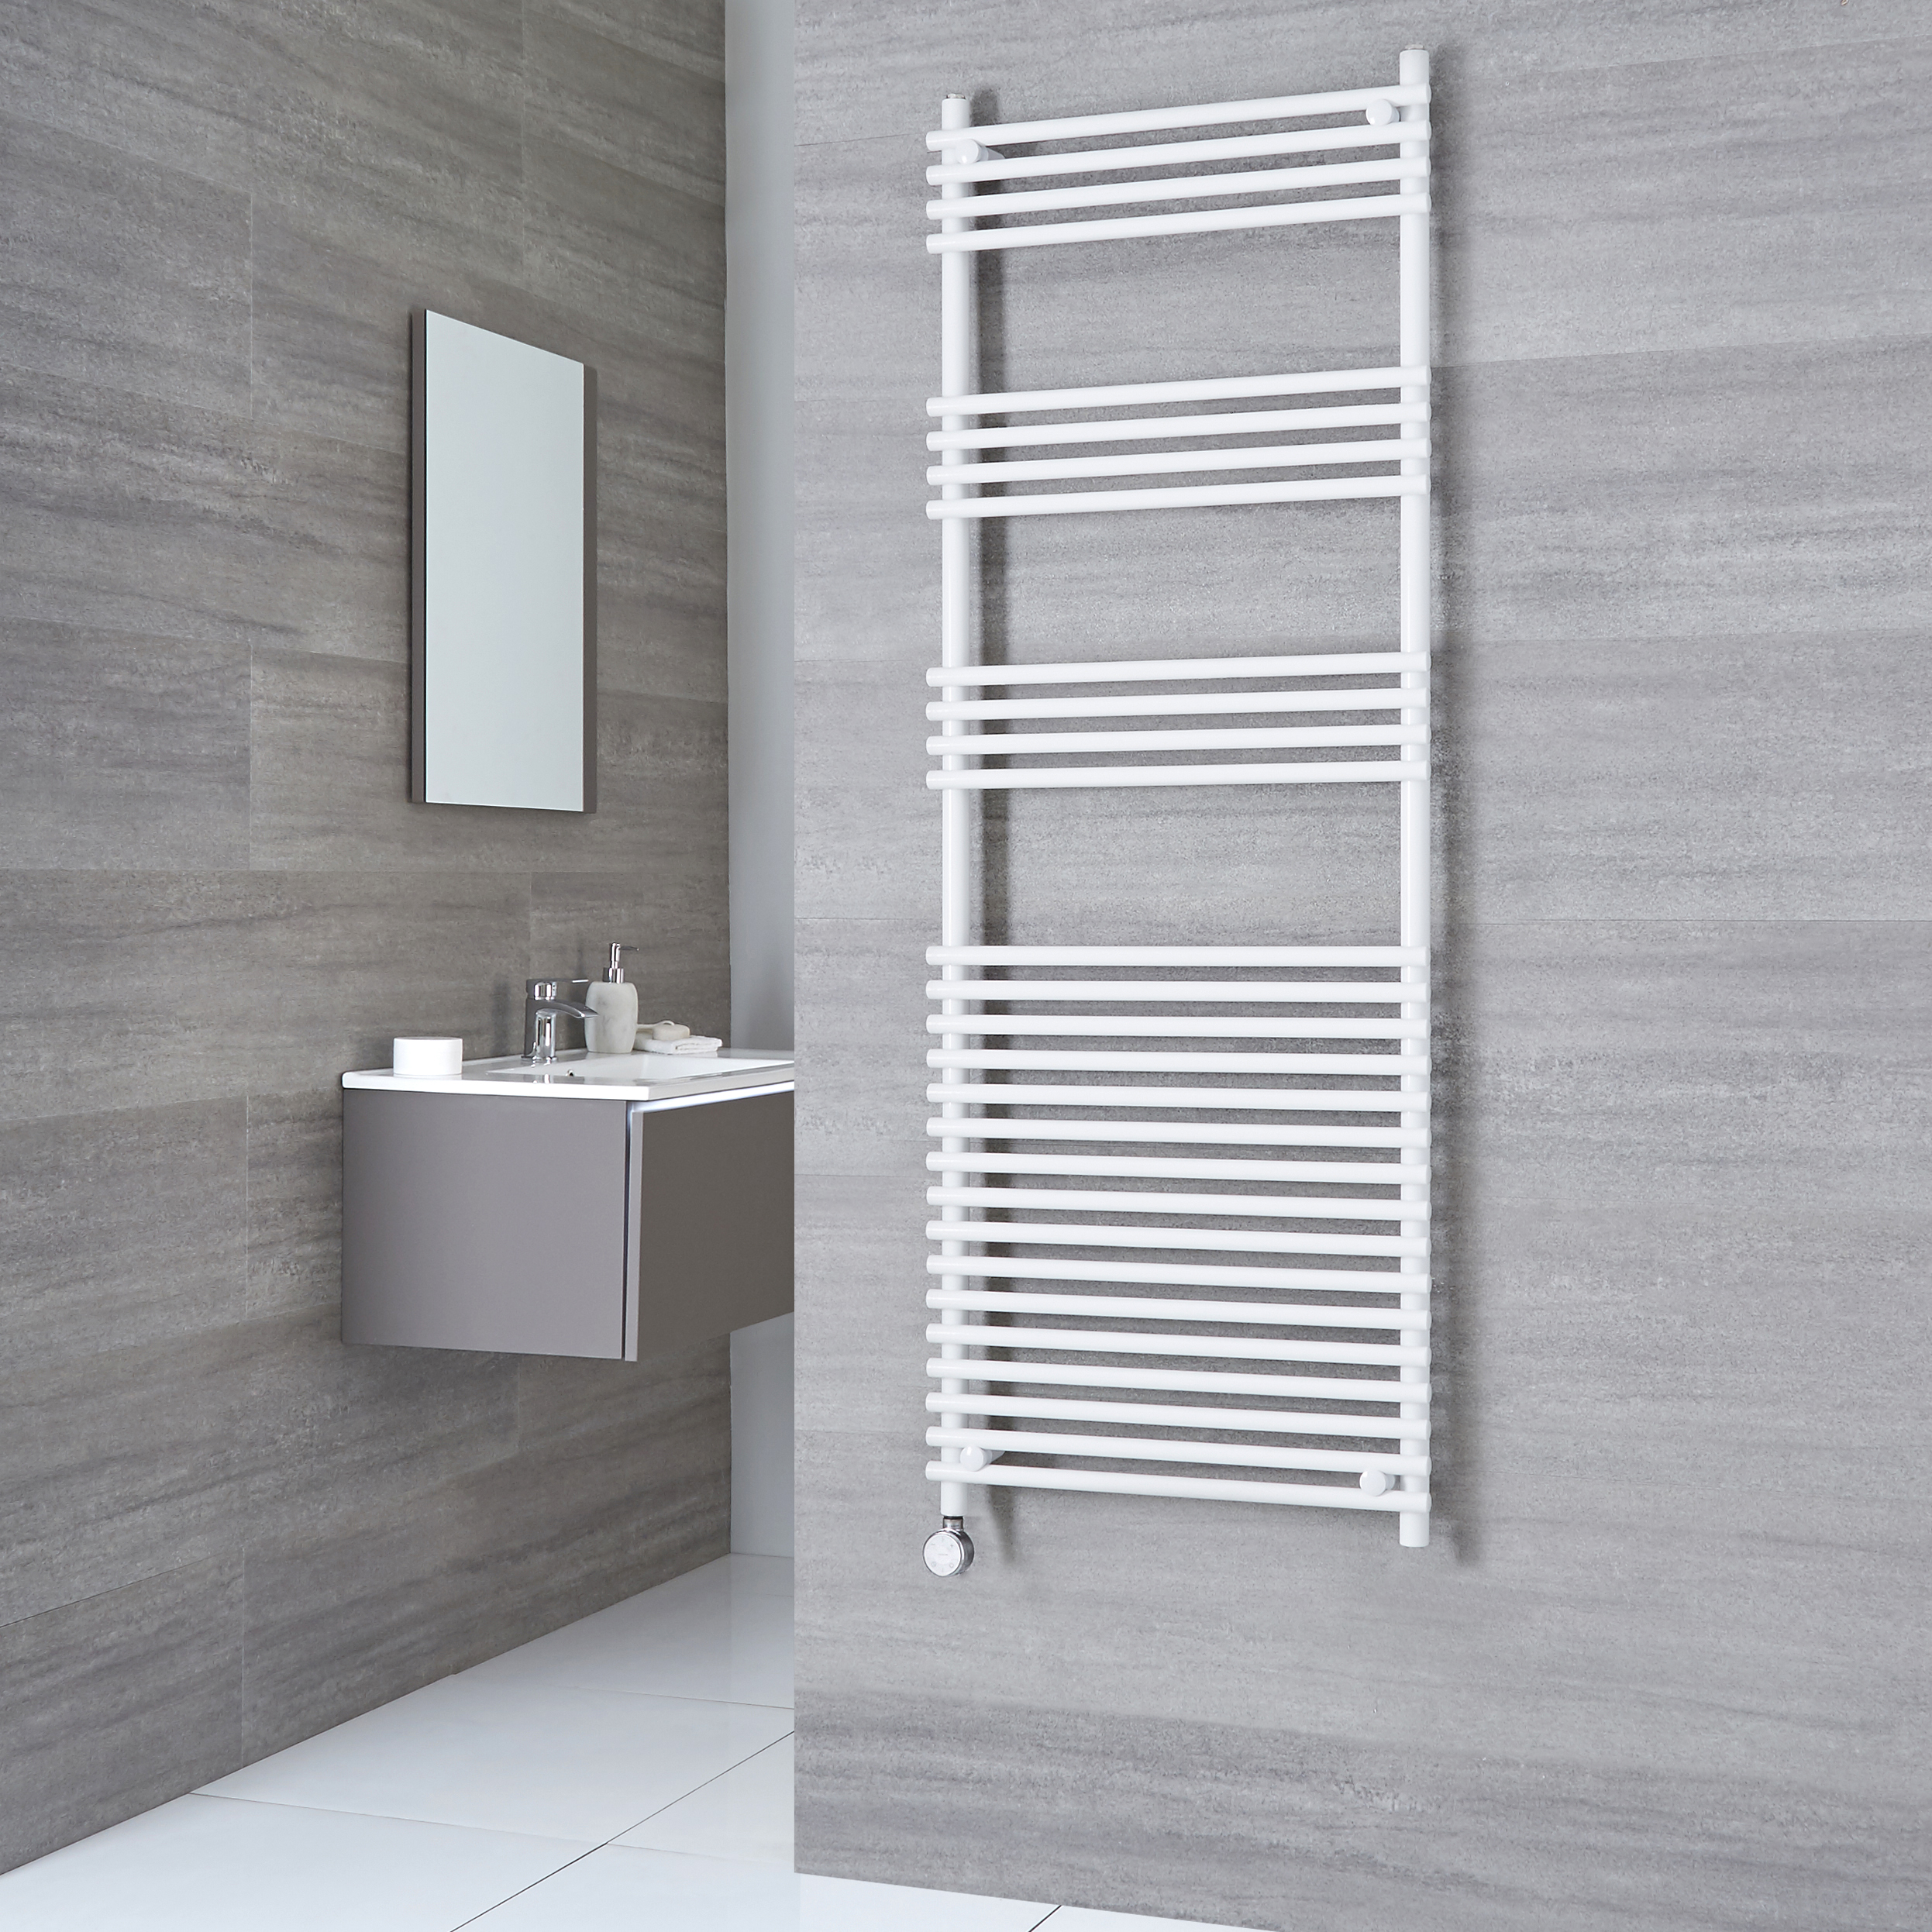 Kudox Electric - Flat White Bar on Bar Towel Rail 1650mm x 600mm